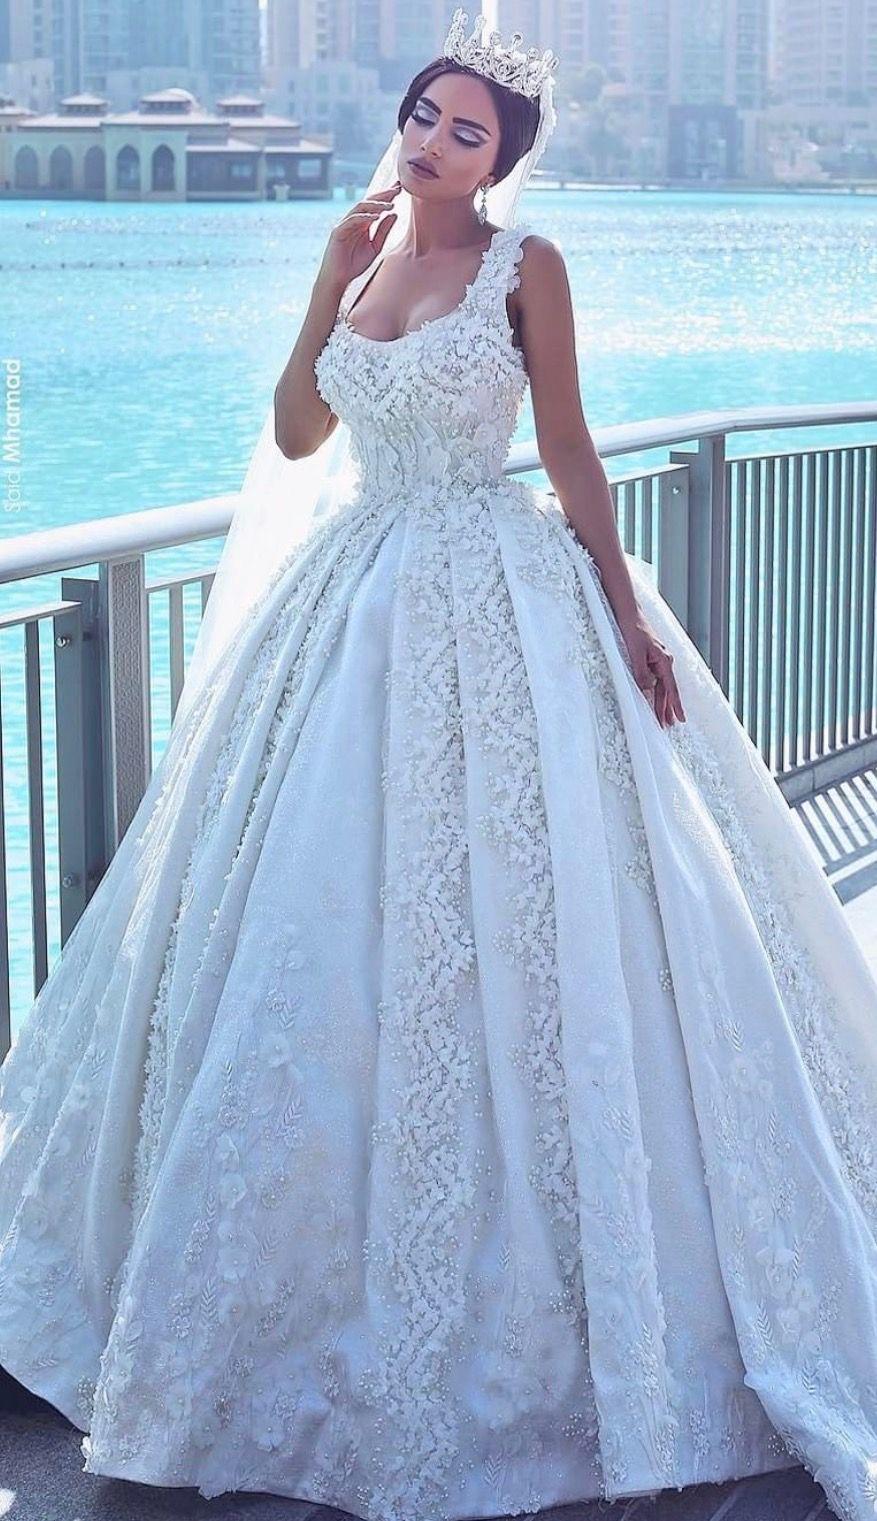 Pin by Alyssa Taylor on Dresses | Pinterest | Wedding dress, Wedding ...